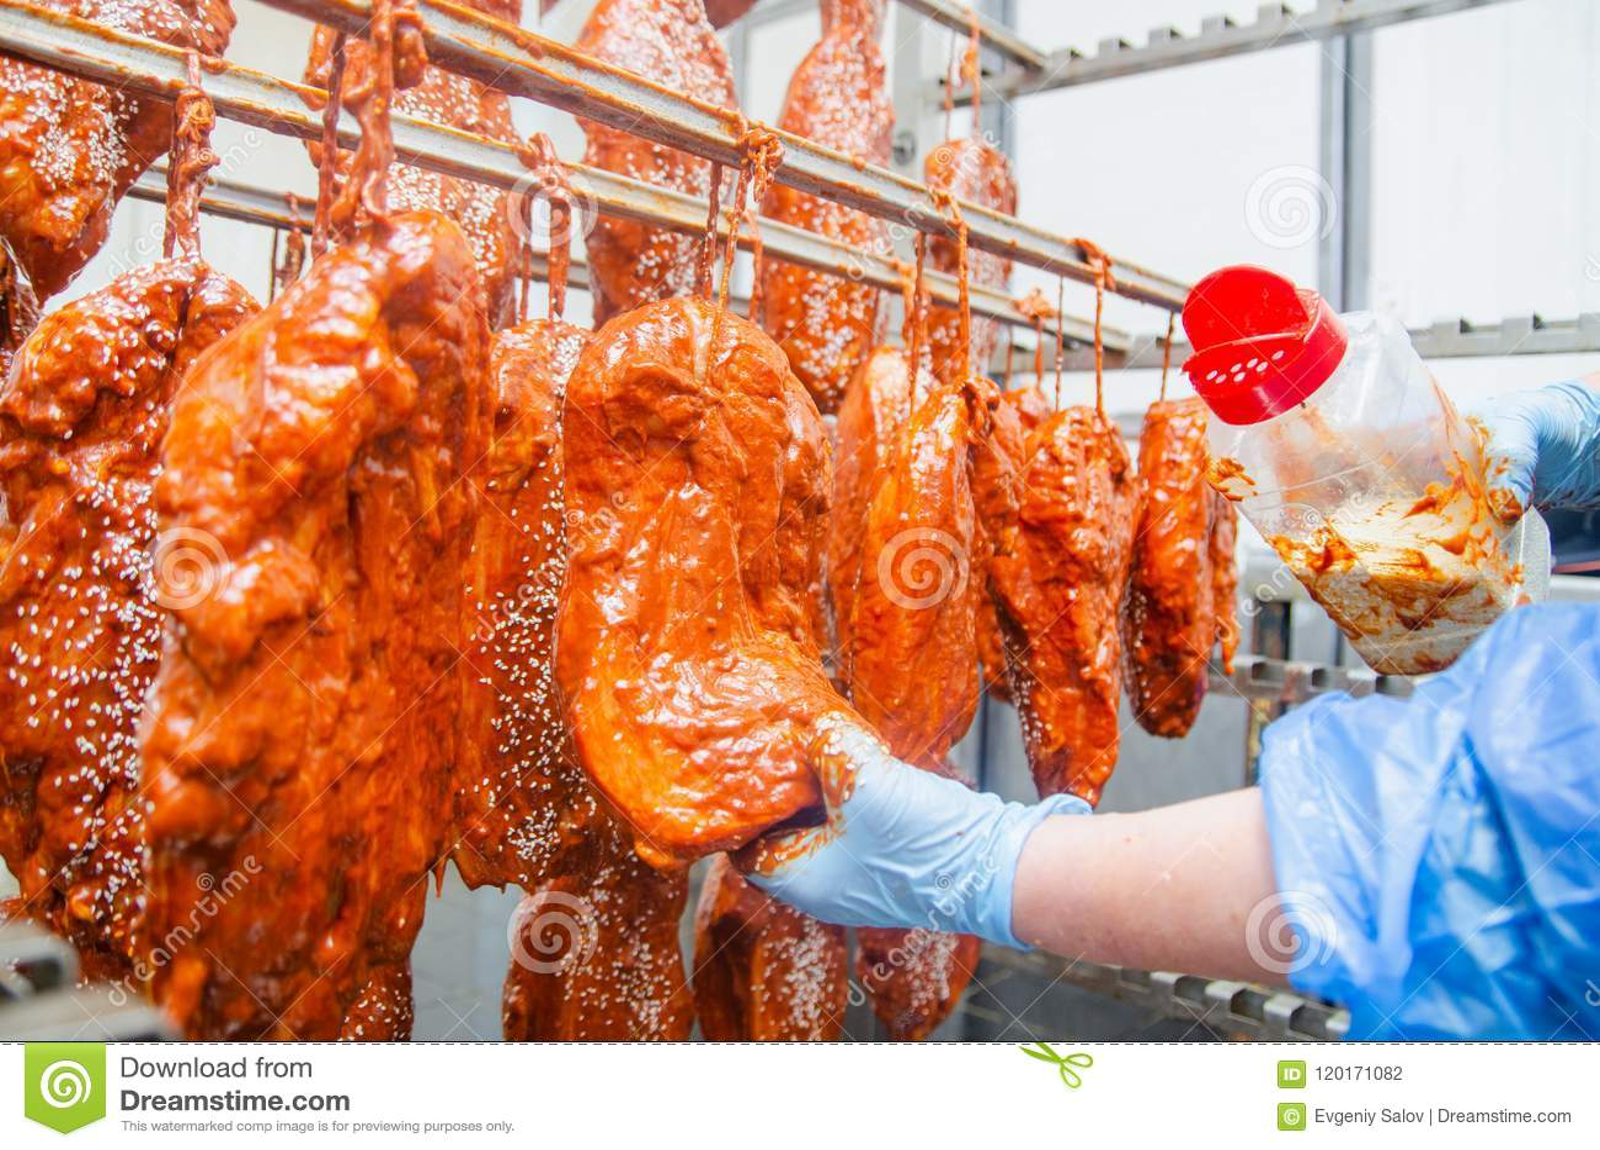 Pork Η γραμμή για την παραγωγή των καπνισμένων λιχουδιών industri